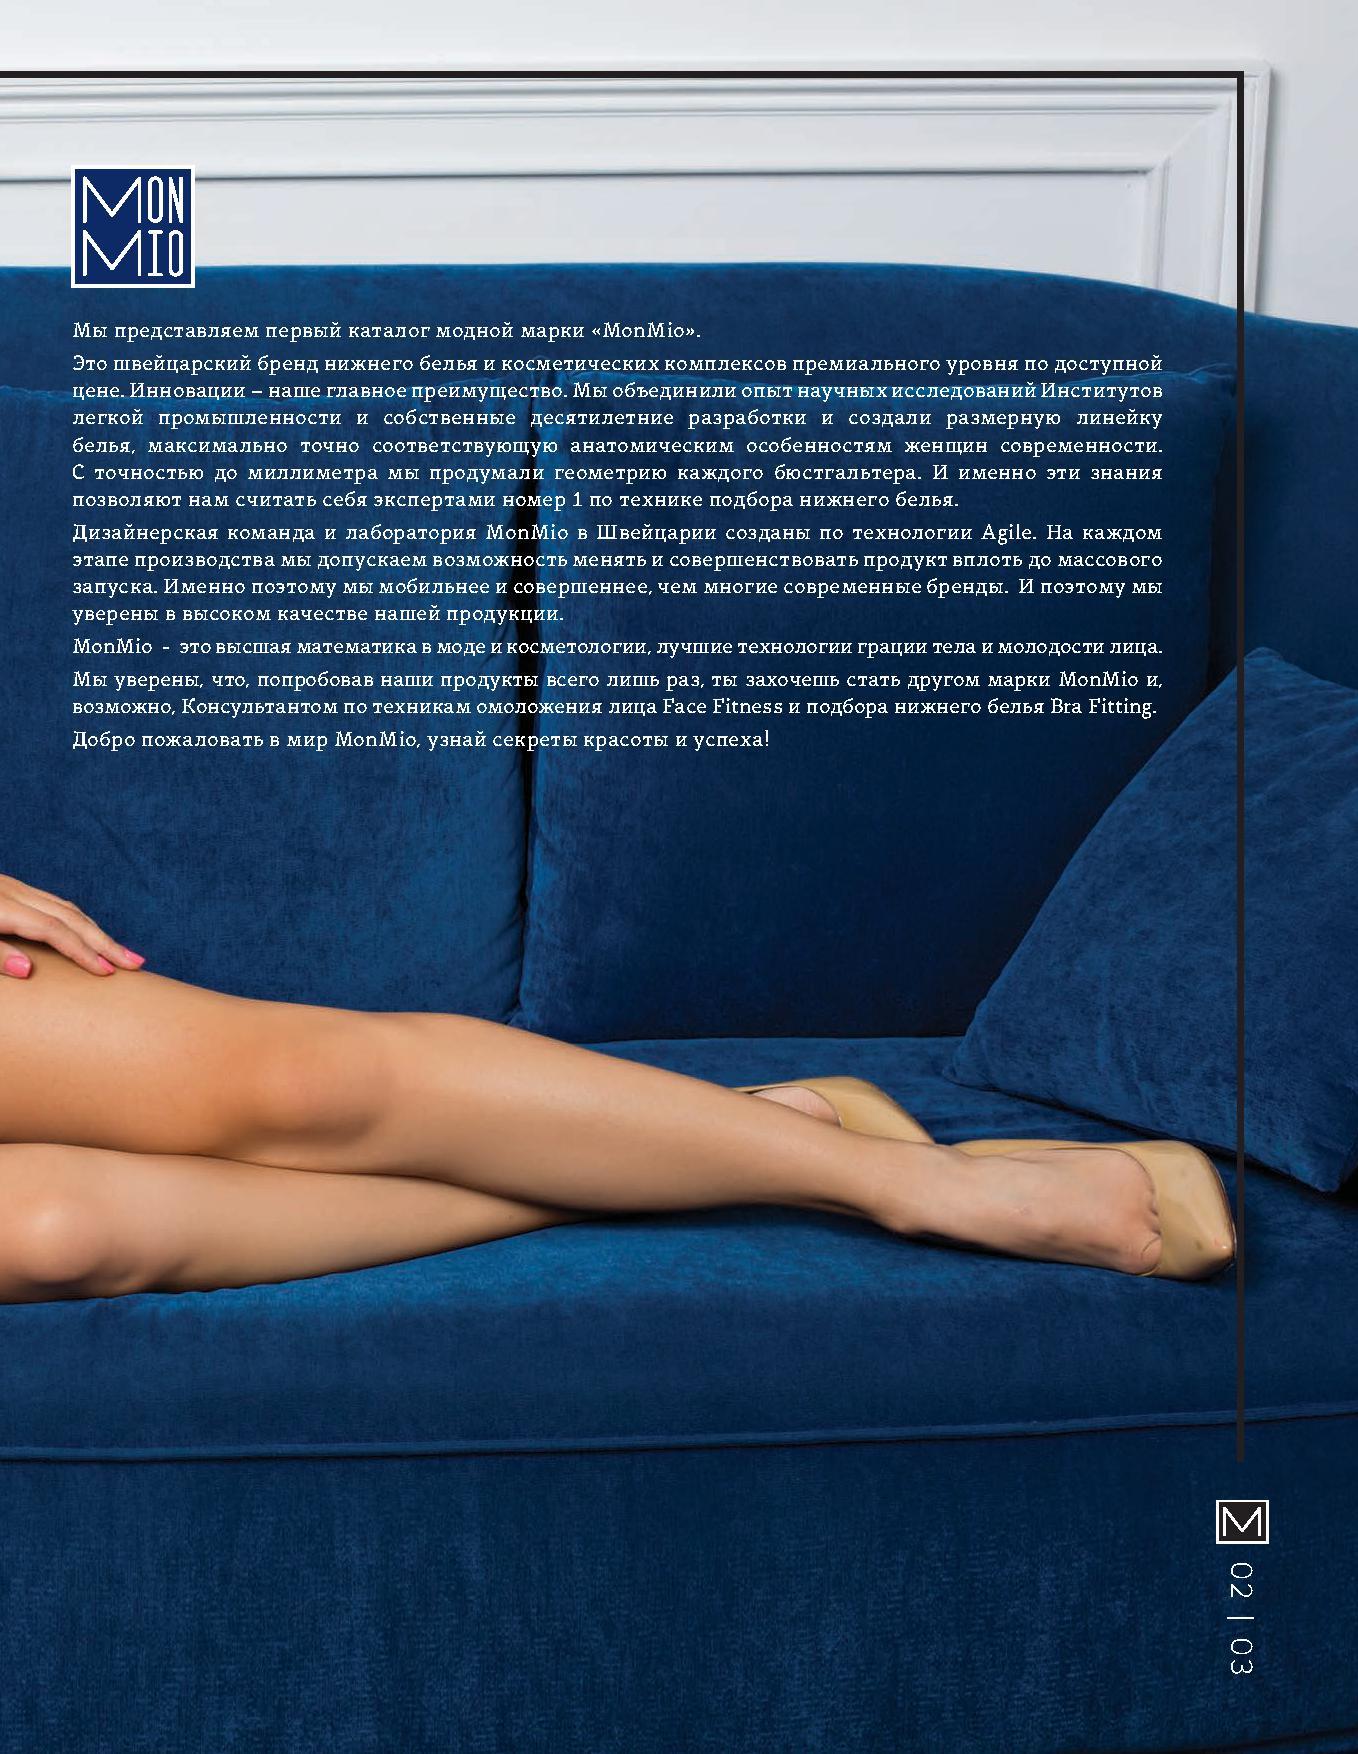 комплект Passion (Пешшин) бюстгальтер трусики каталога МонМио осень - зима 2018/2019